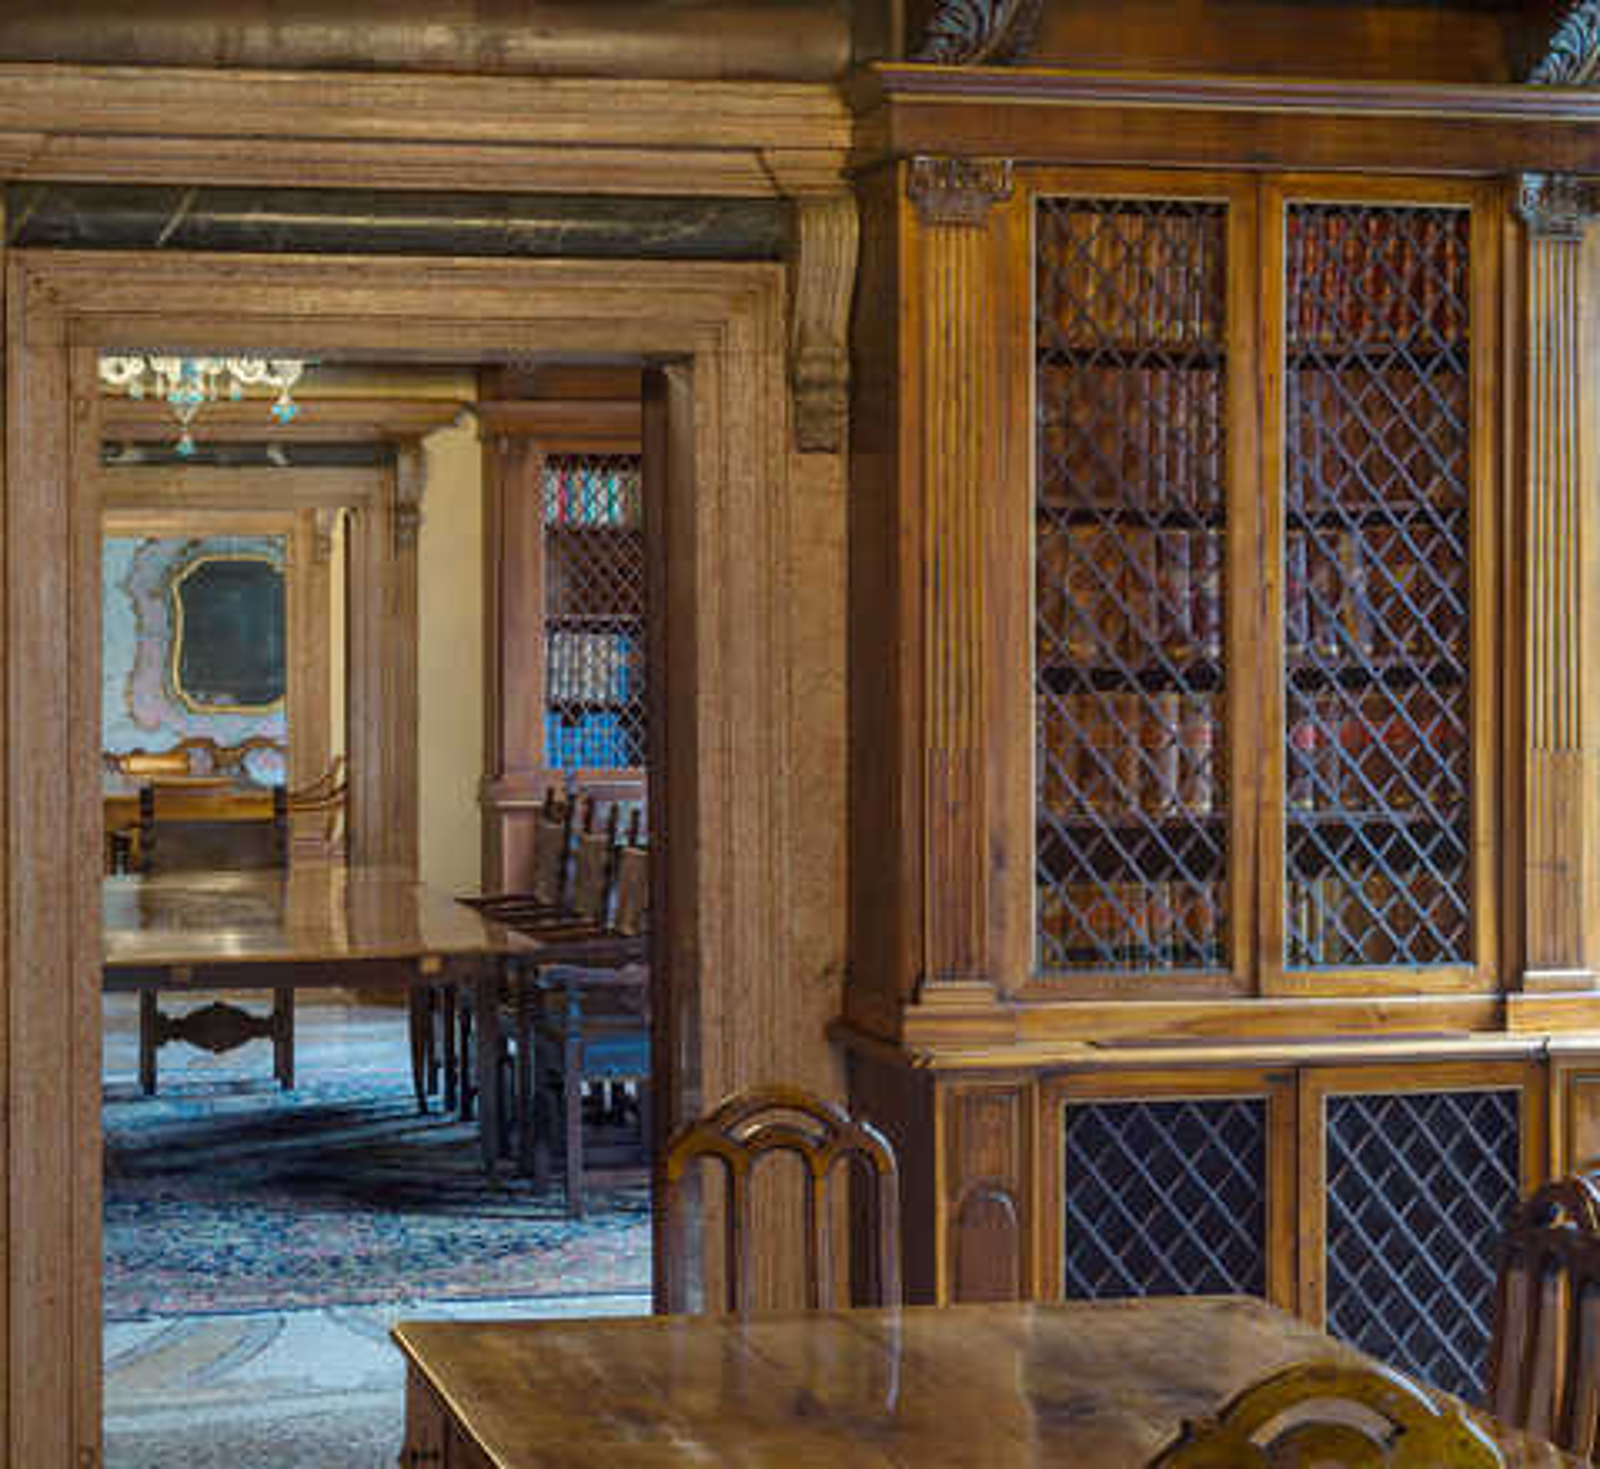 Istituto Veneto, Bibliothek - Reinhard Görner